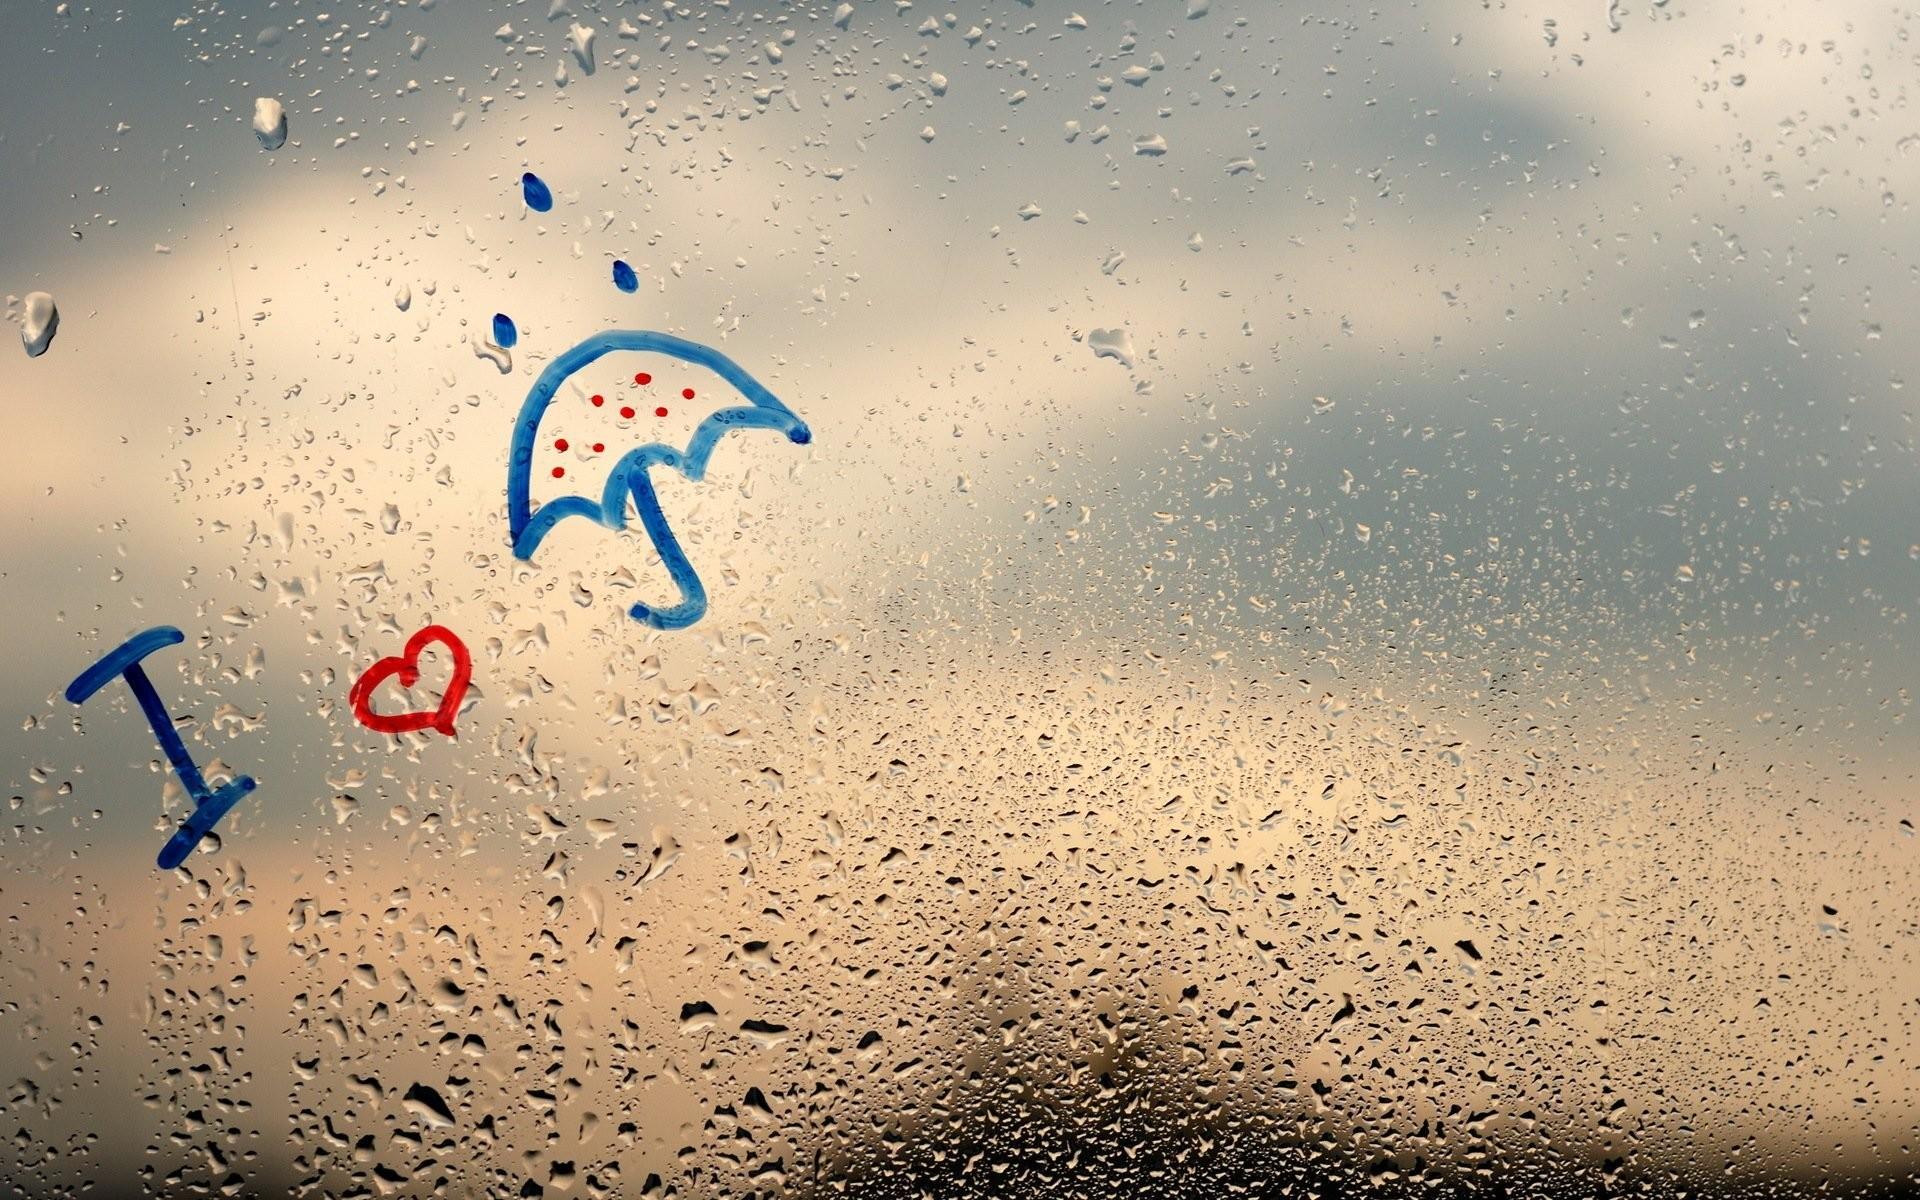 rainy day window raindrops rain